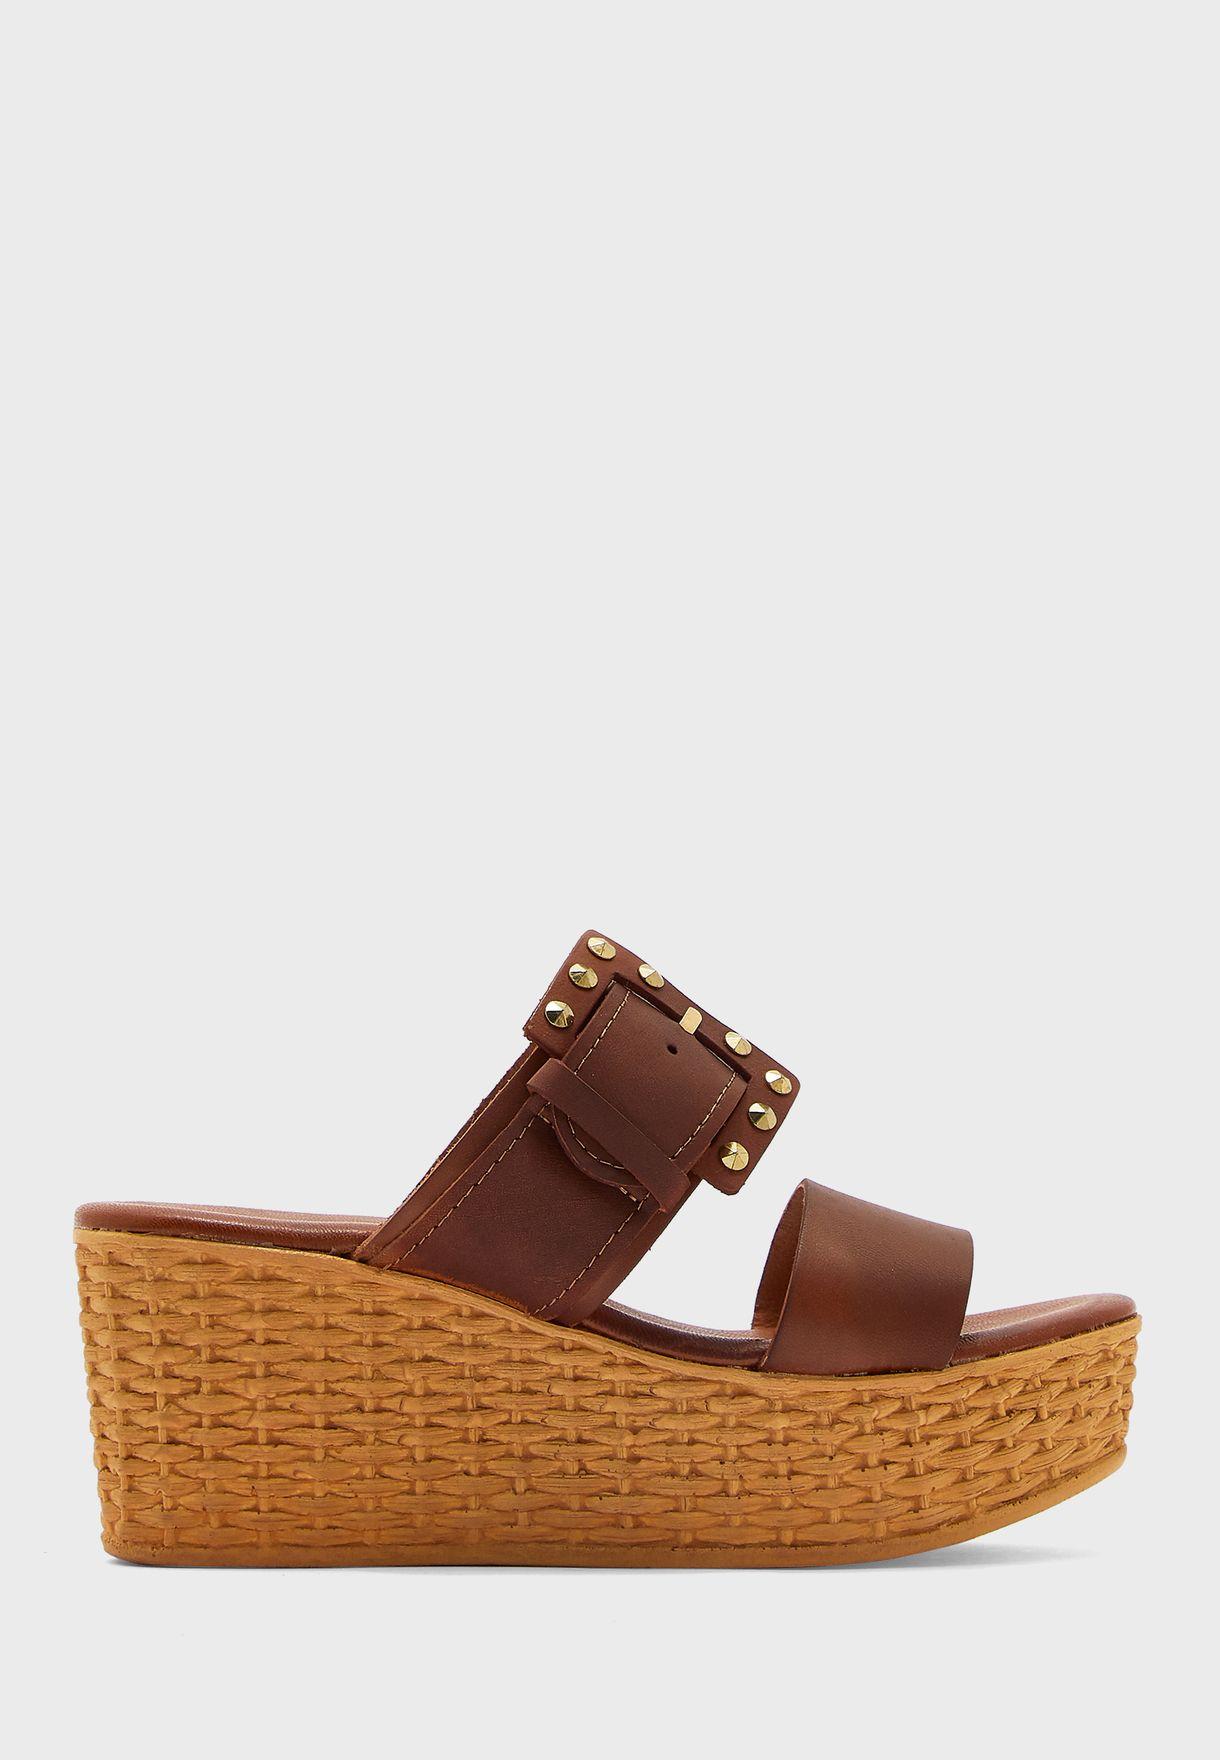 Buckle Detail Mid Heel Wedge Sandals